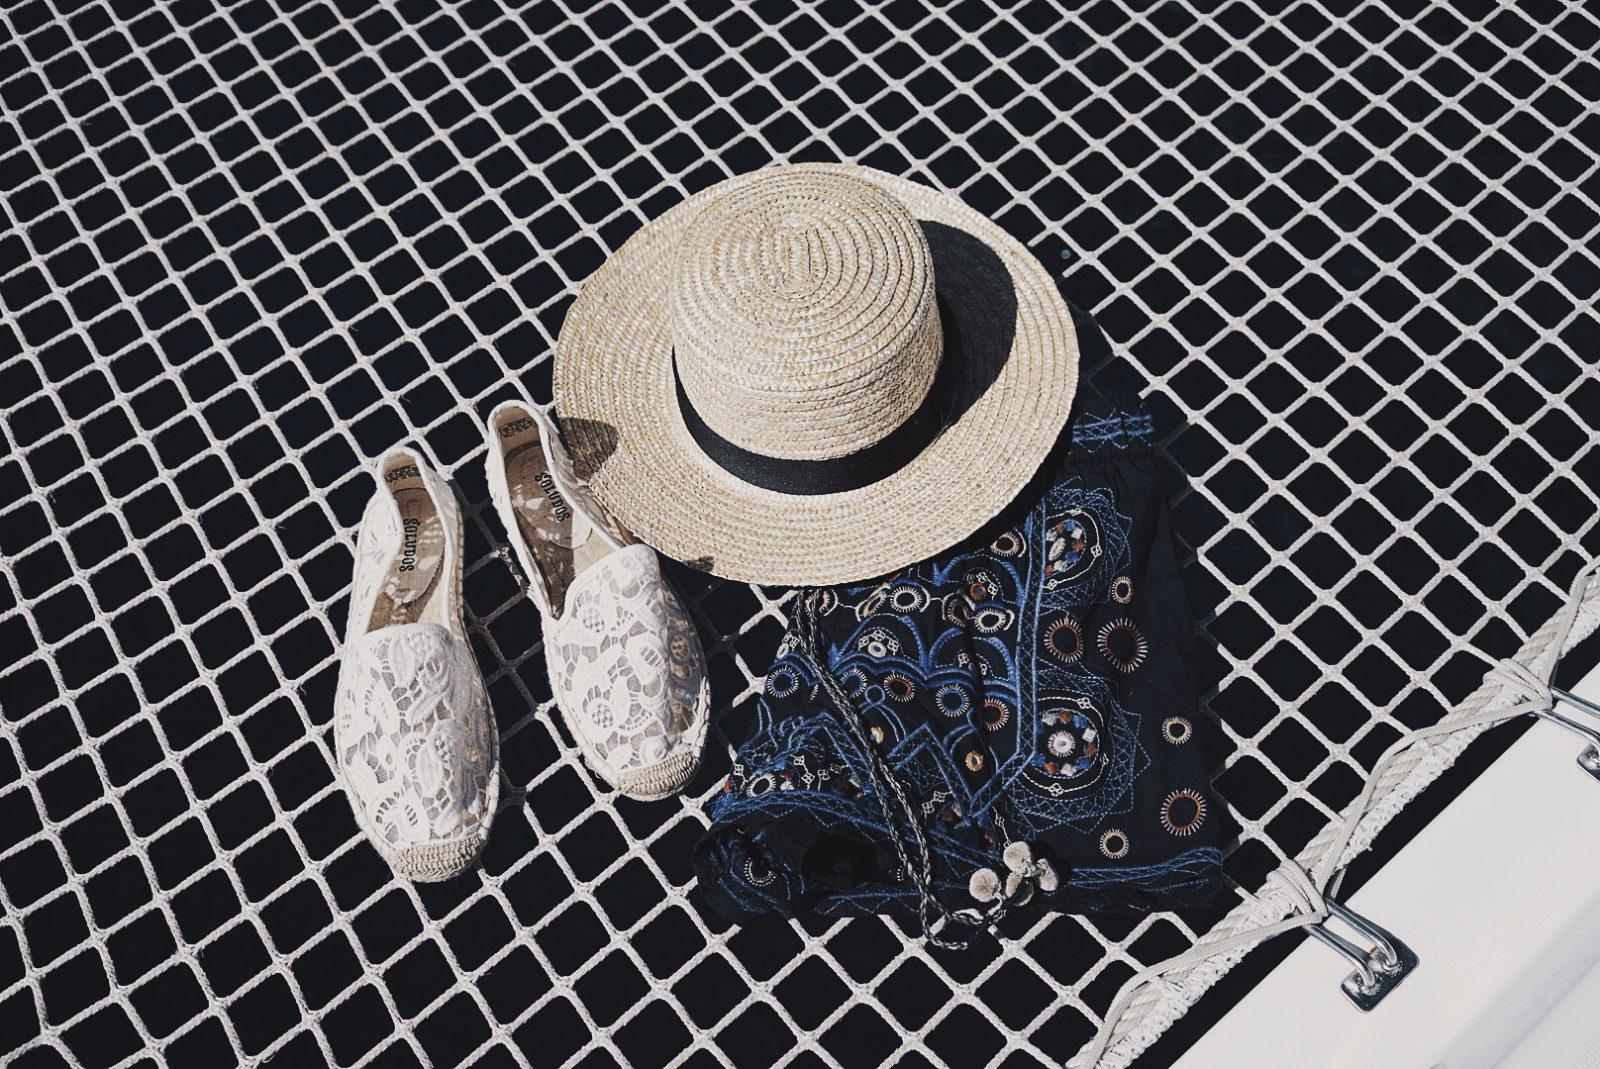 Soludos_Escapes-Boat_Trip-Bikini-Summer_Look-Santorini_Greece-GRLFRND_Jeans-Off_The_Shoulders-Collage_Vintage-Street_Style-Soludos_Espadrilles-43